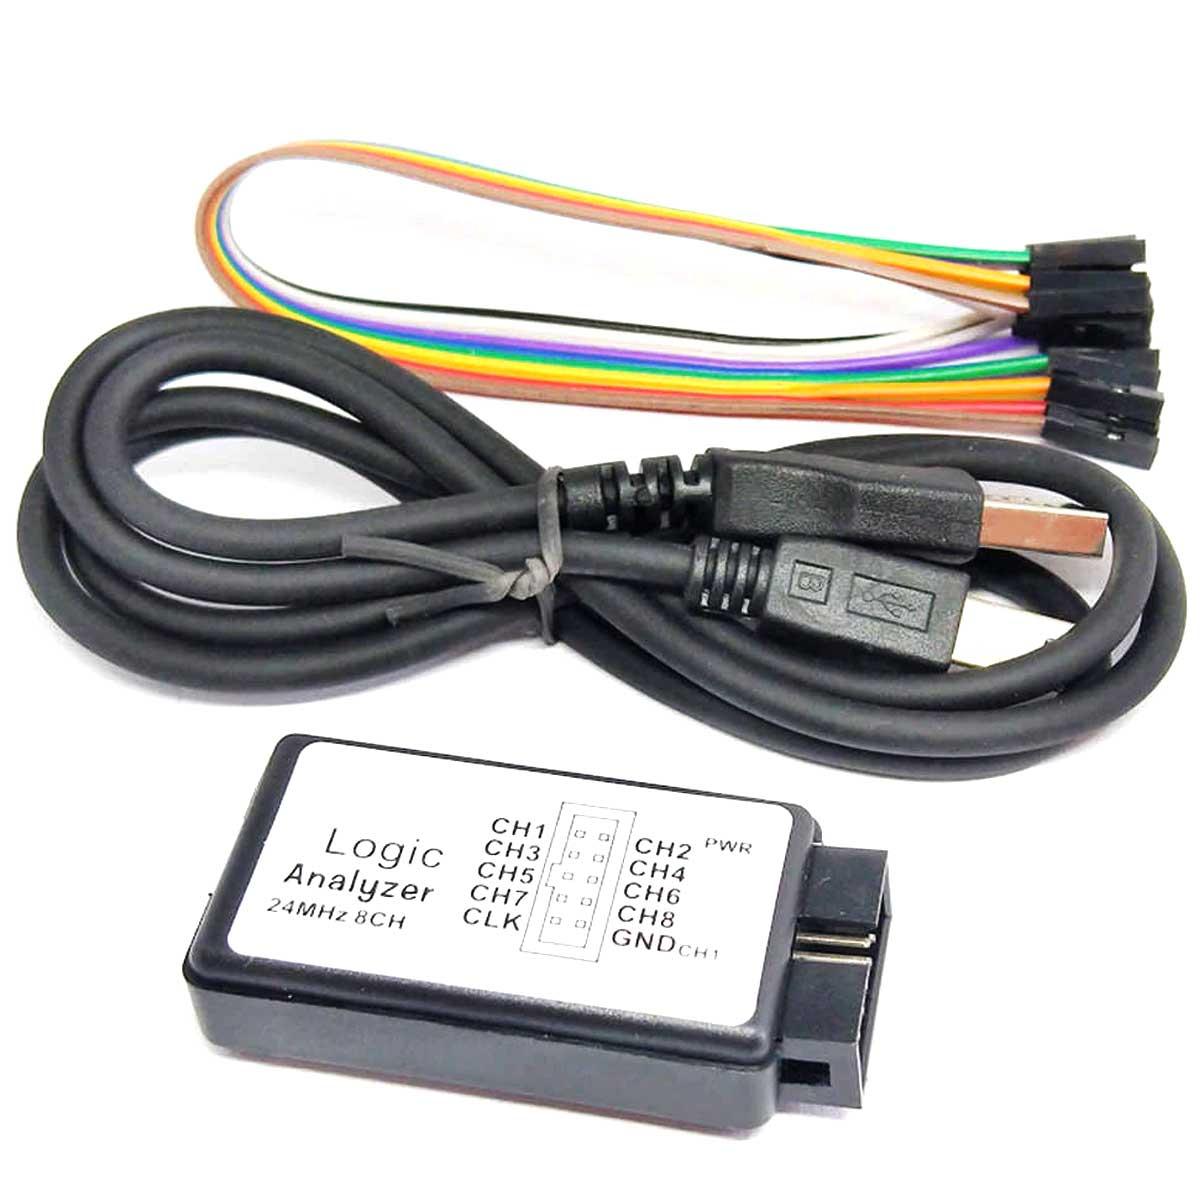 Analisador Lógico 8 Canais com Interface USB - Saleae Logic 8ch